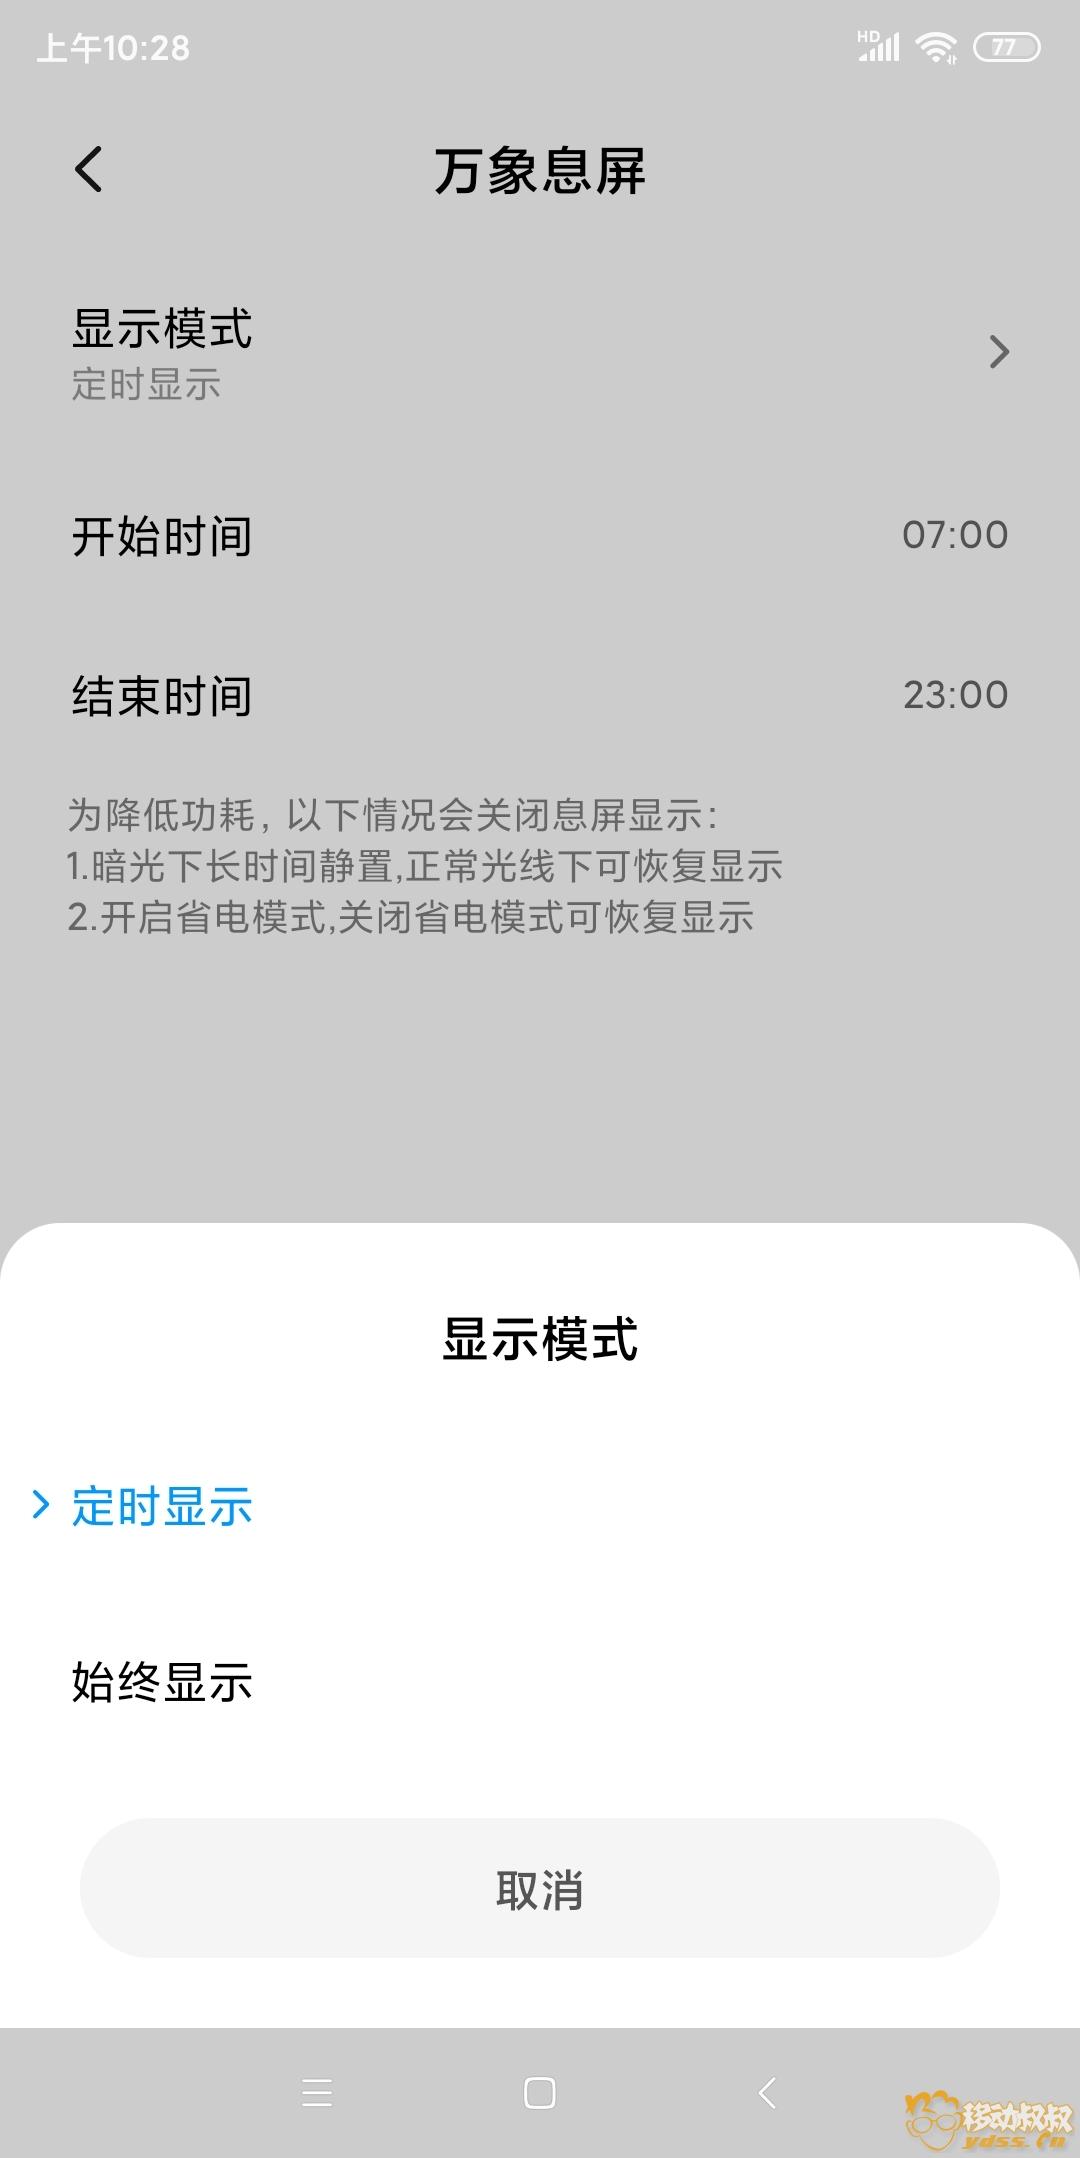 Screenshot_2019-11-06-10-28-14-796_com.miui.aod.jpg